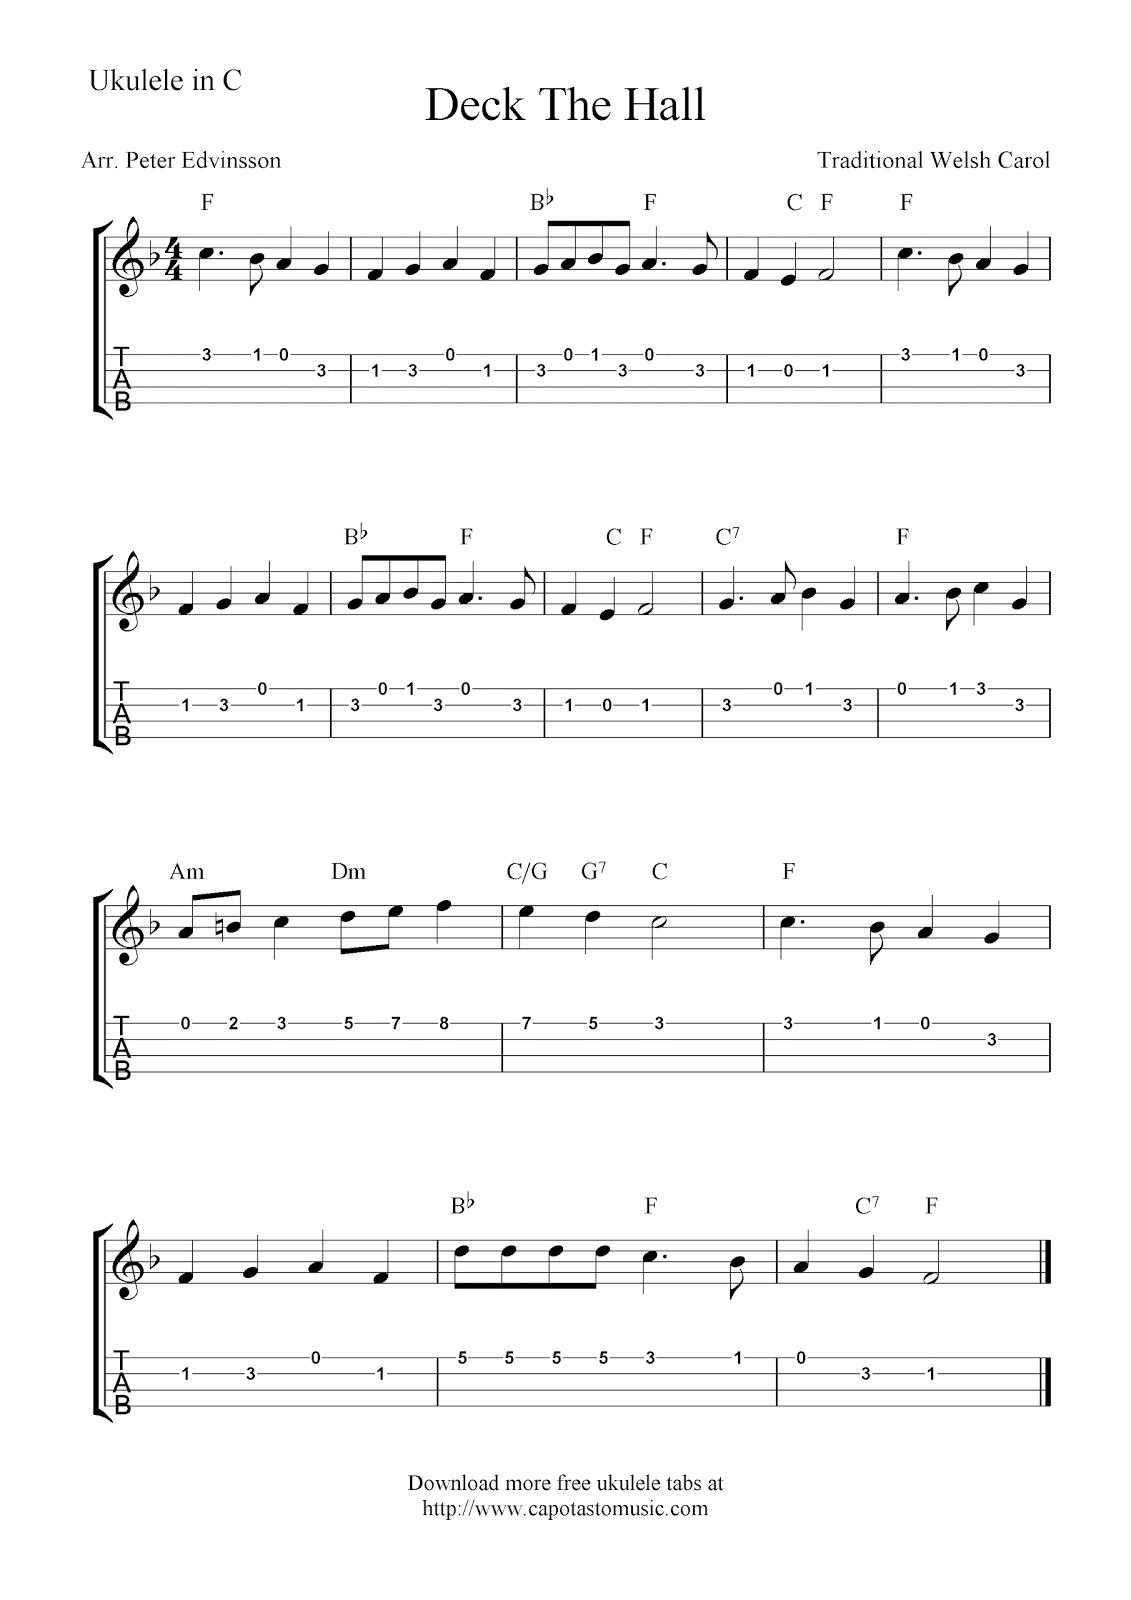 Deck The Hall, free Christmas ukulele tab sheet music